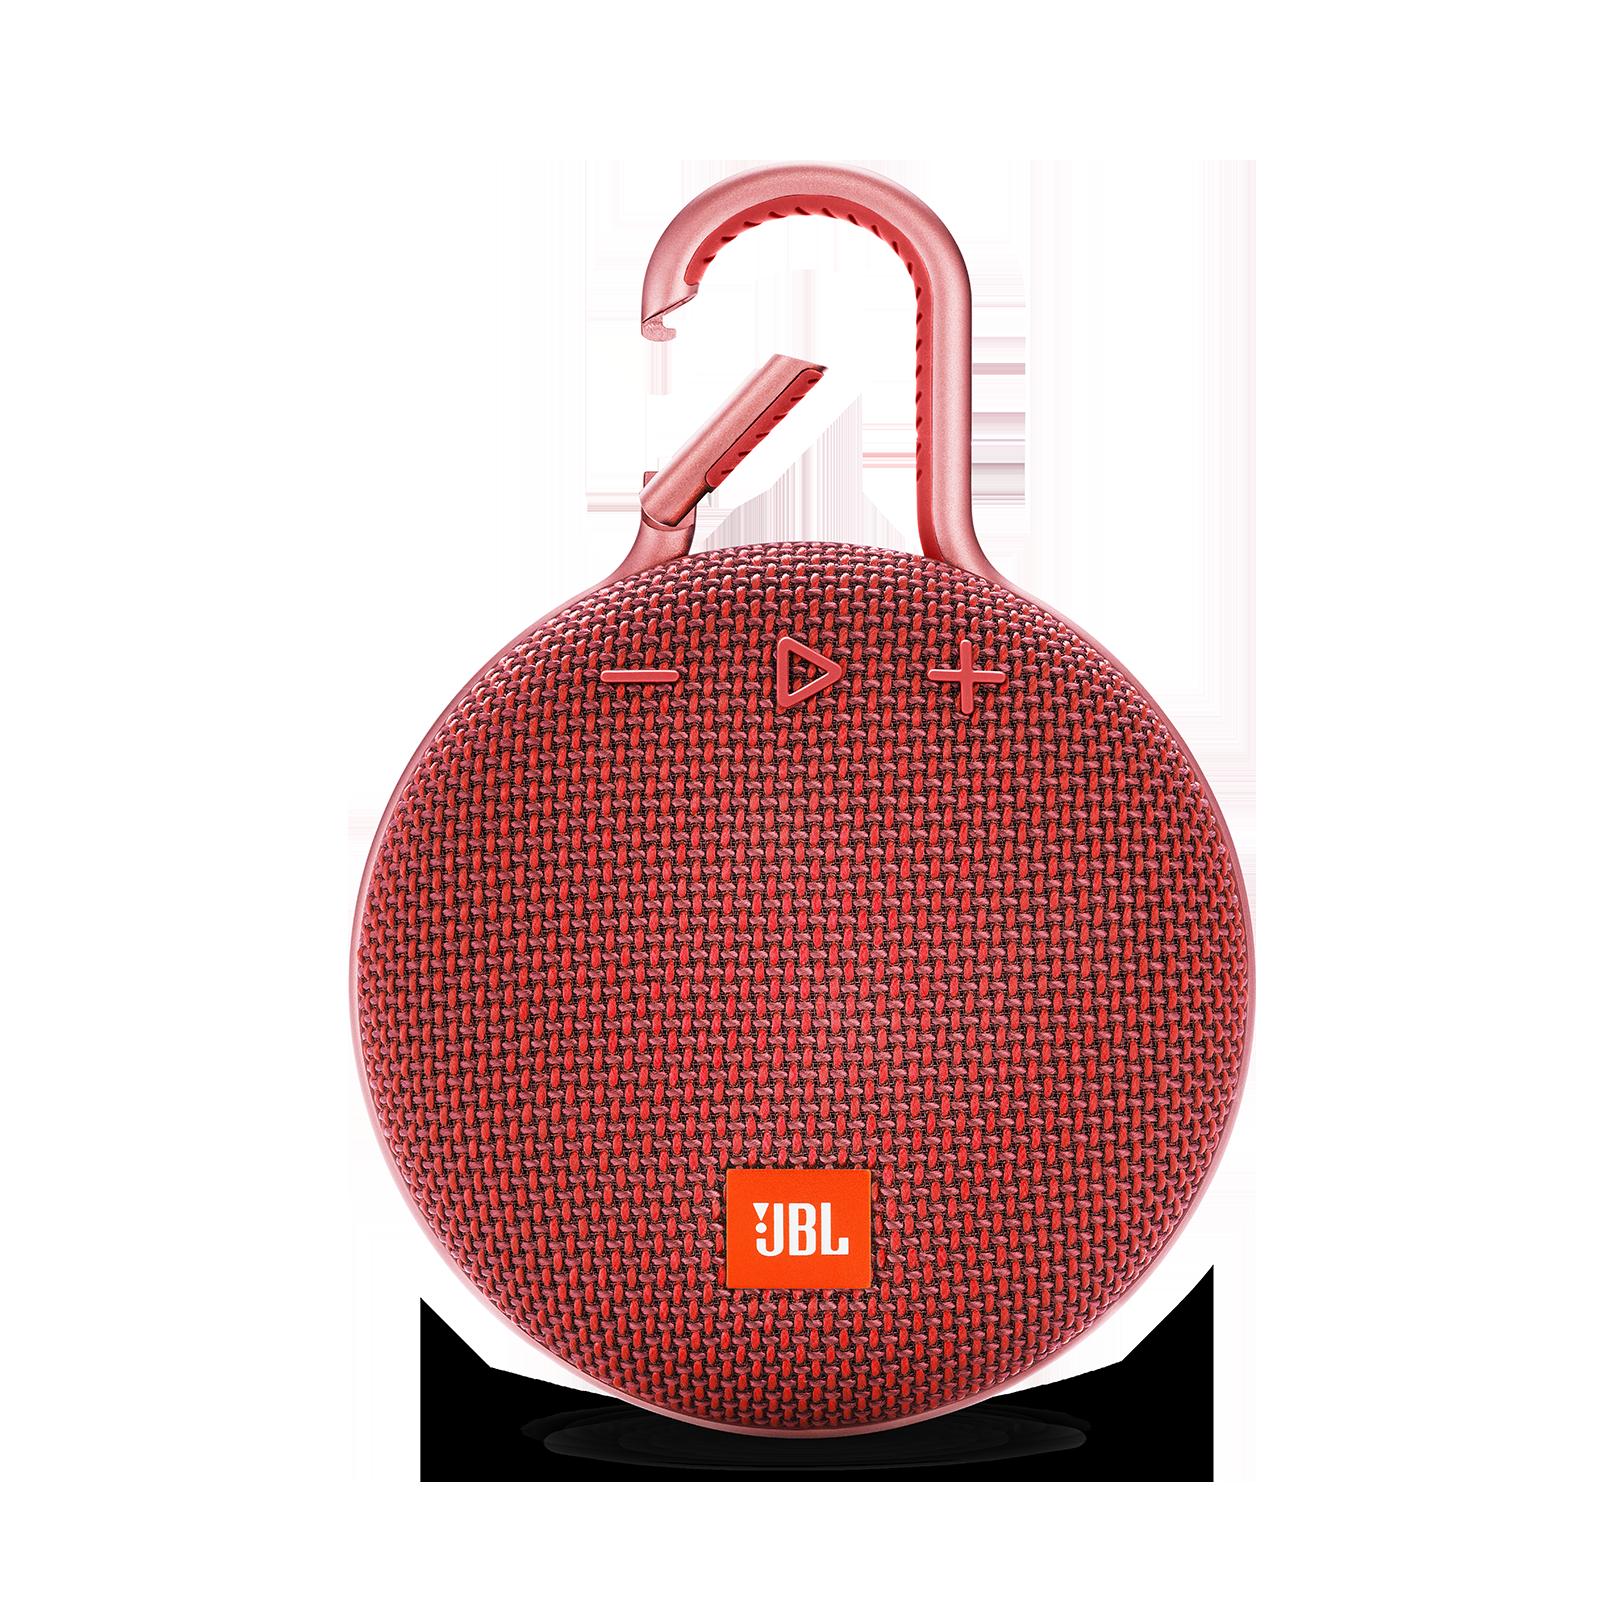 JBL CLIP 3 - Fiesta Red - Portable Bluetooth® speaker - Front